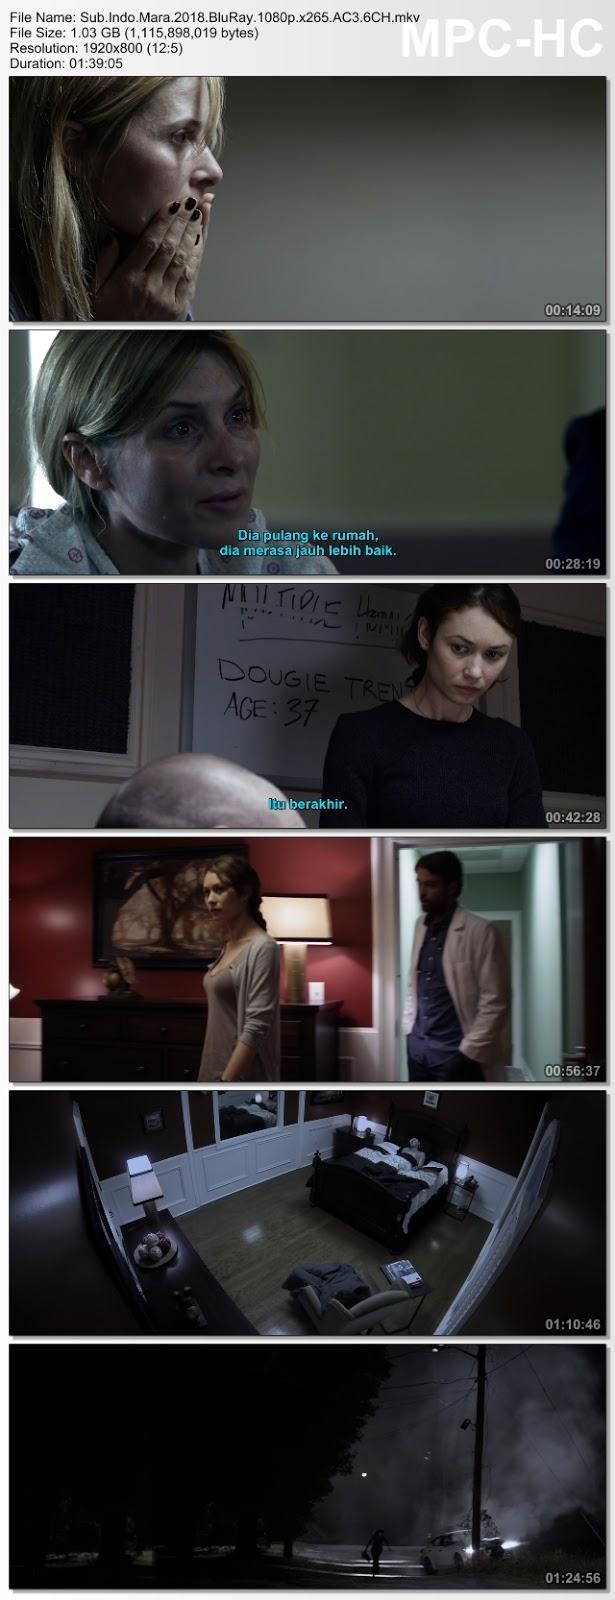 Screenshots Download Мара. Пожиратель снов (2018) BluRay 480p & 3GP Subtitle Indonesia